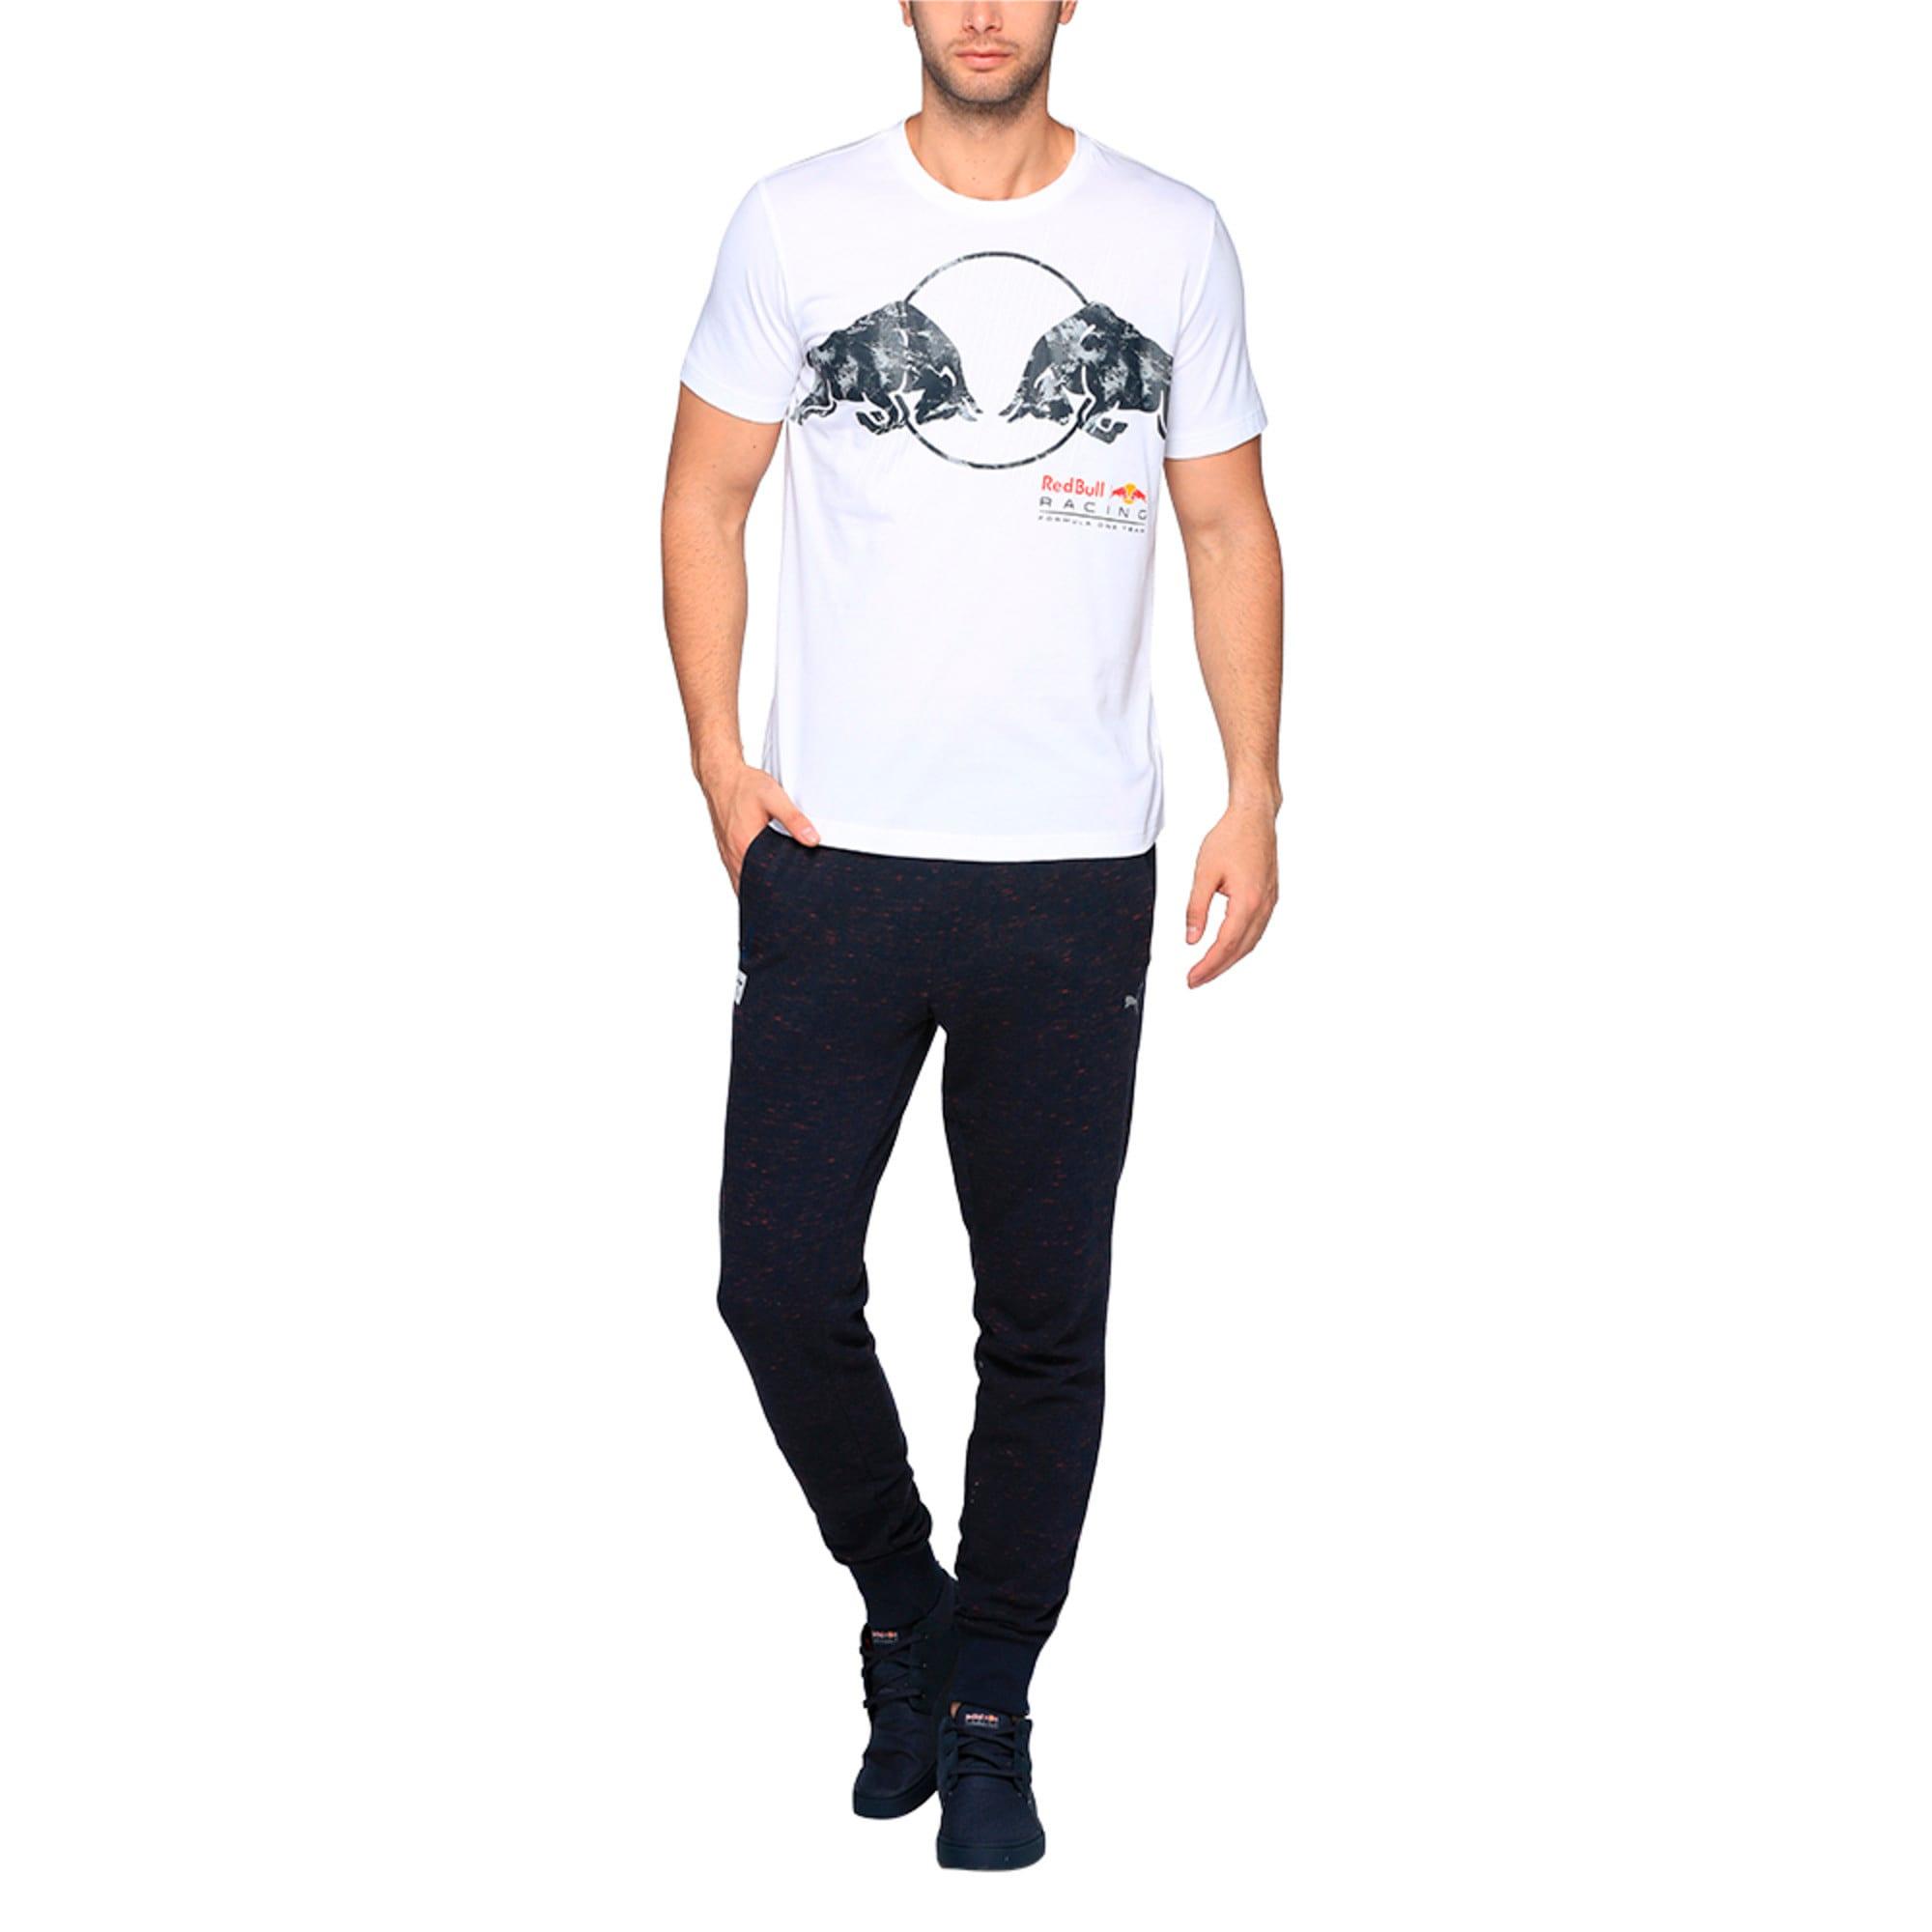 Thumbnail 3 of Red Bull Racing Men's Graphic T-Shirt, Puma White, medium-IND